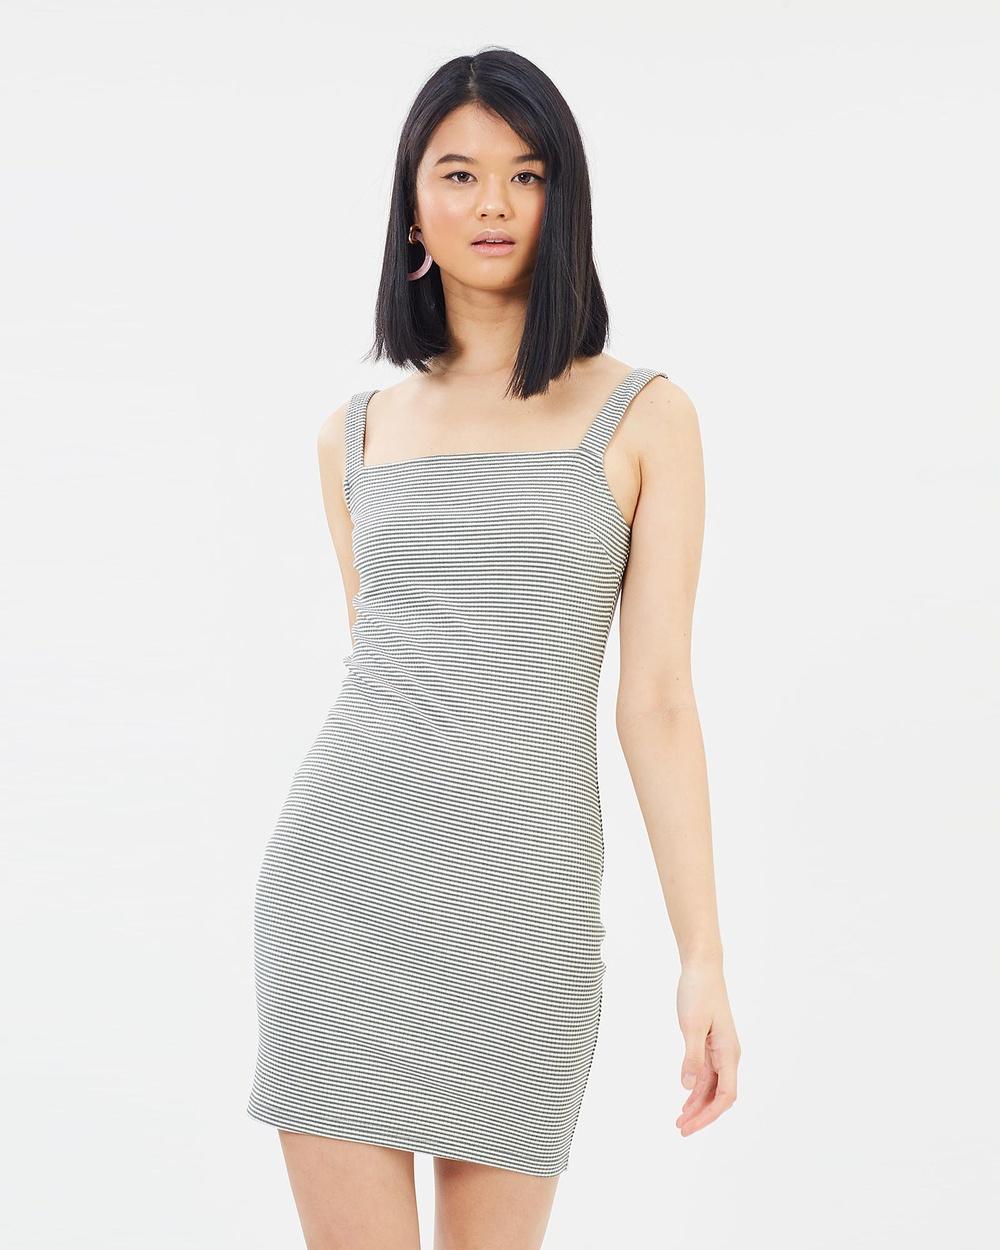 Otto Mode New Elements Dress Bodycon Dresses Green Stripe New Elements Dress